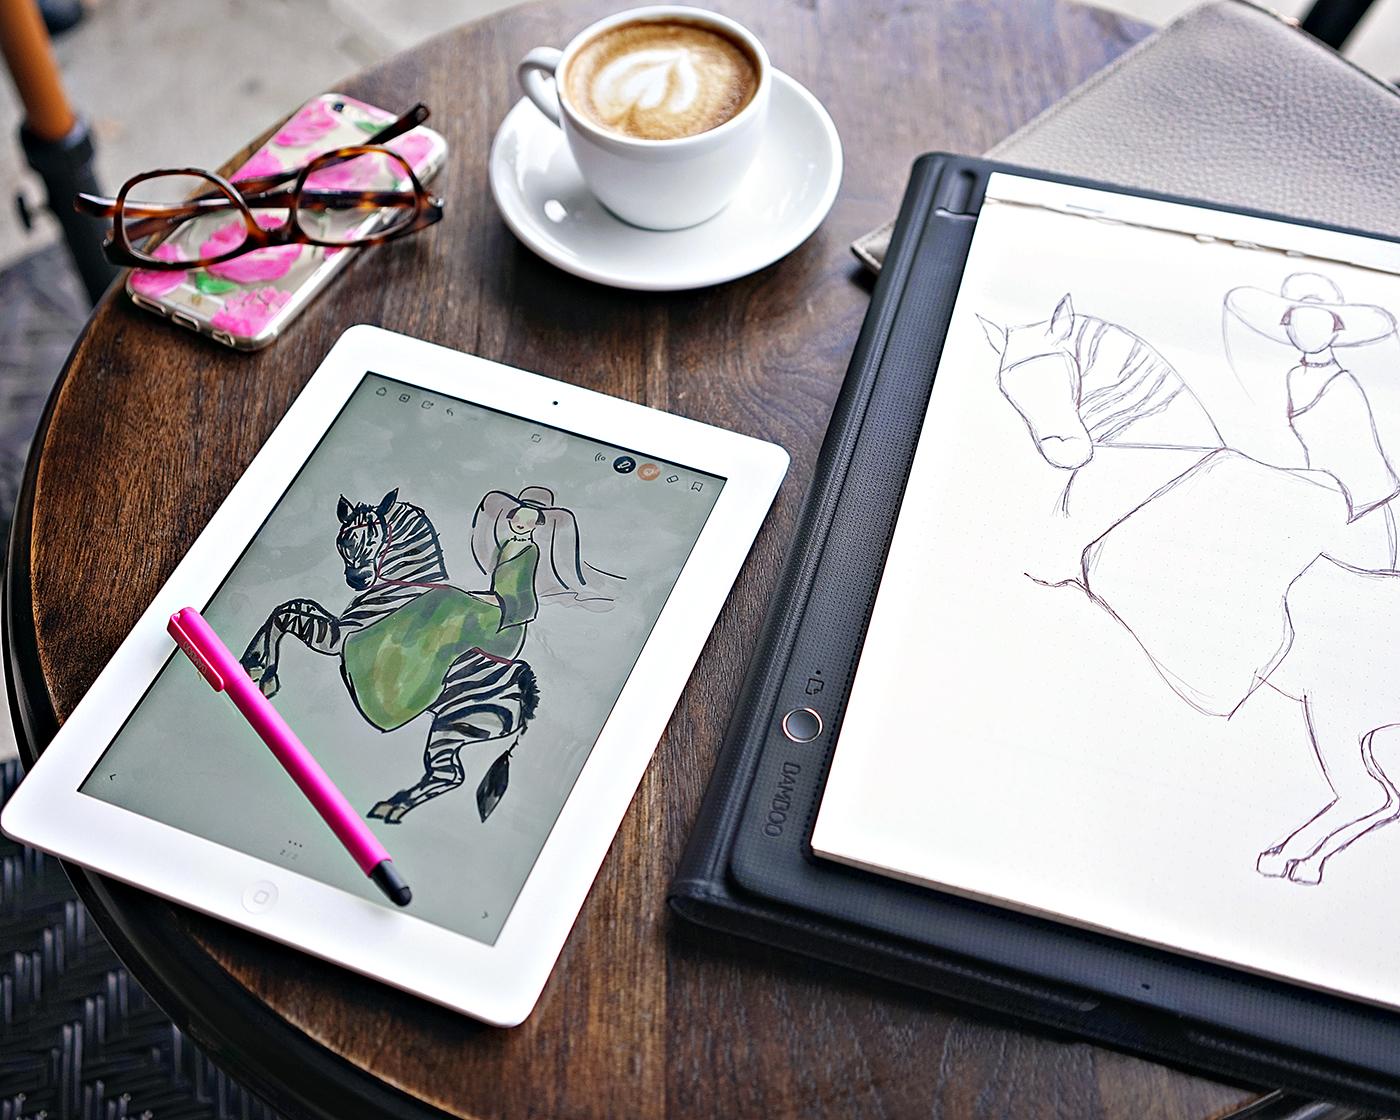 Get Creative With Wacom